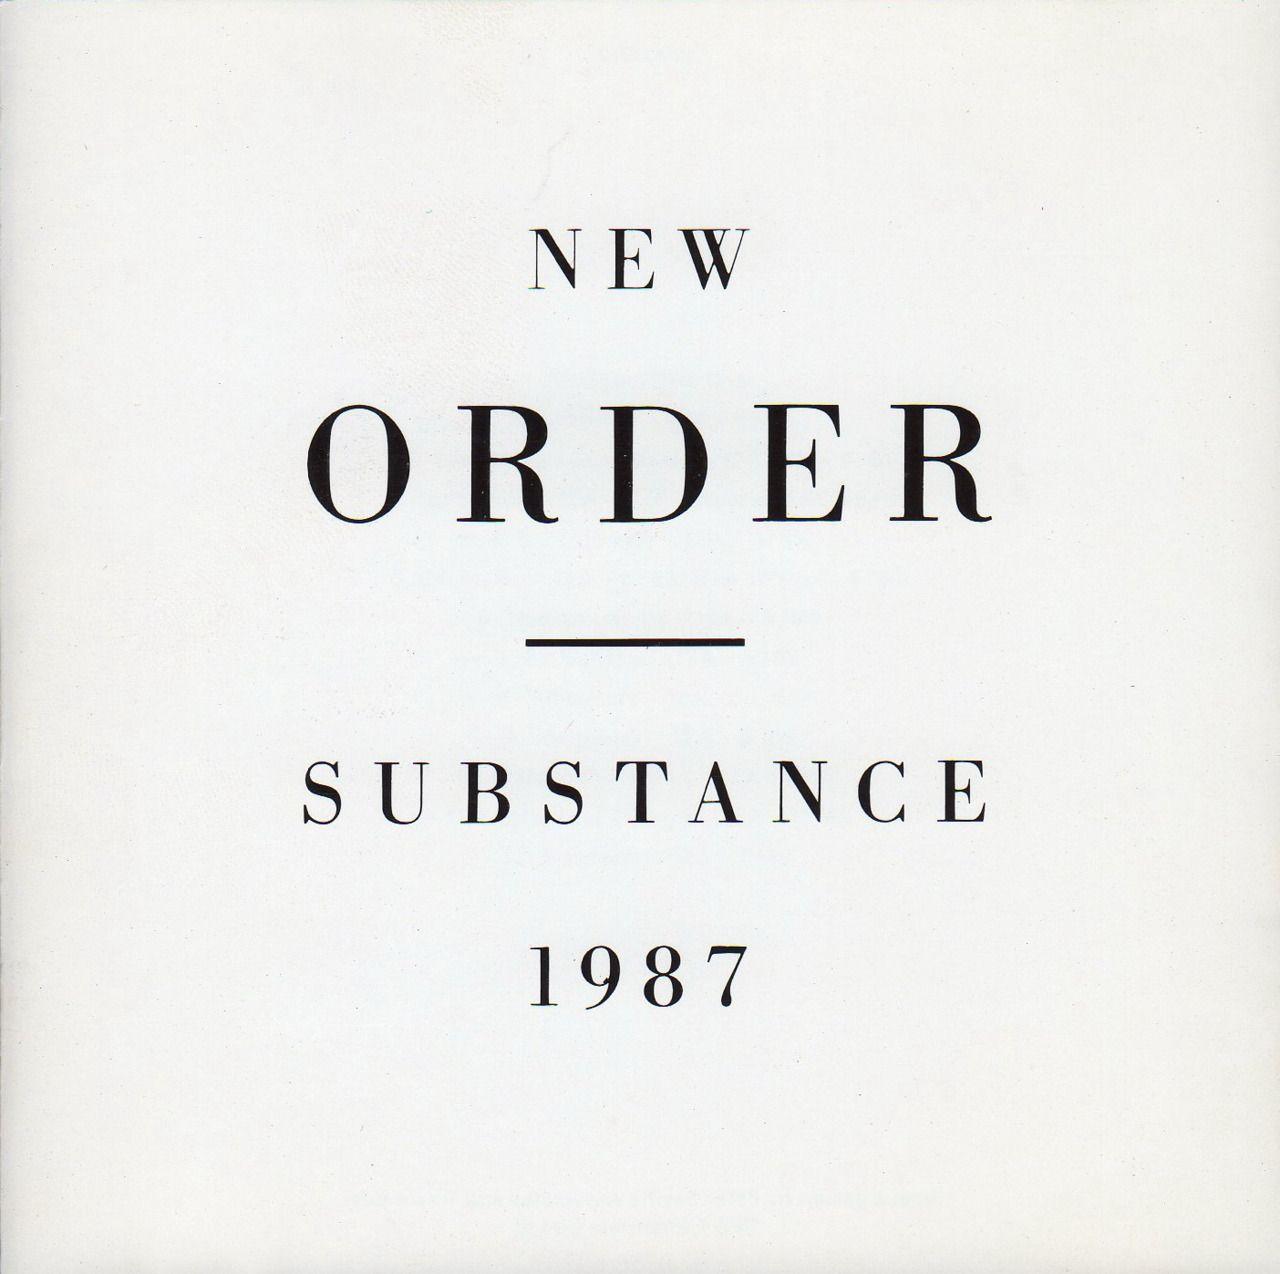 New Order, Substance